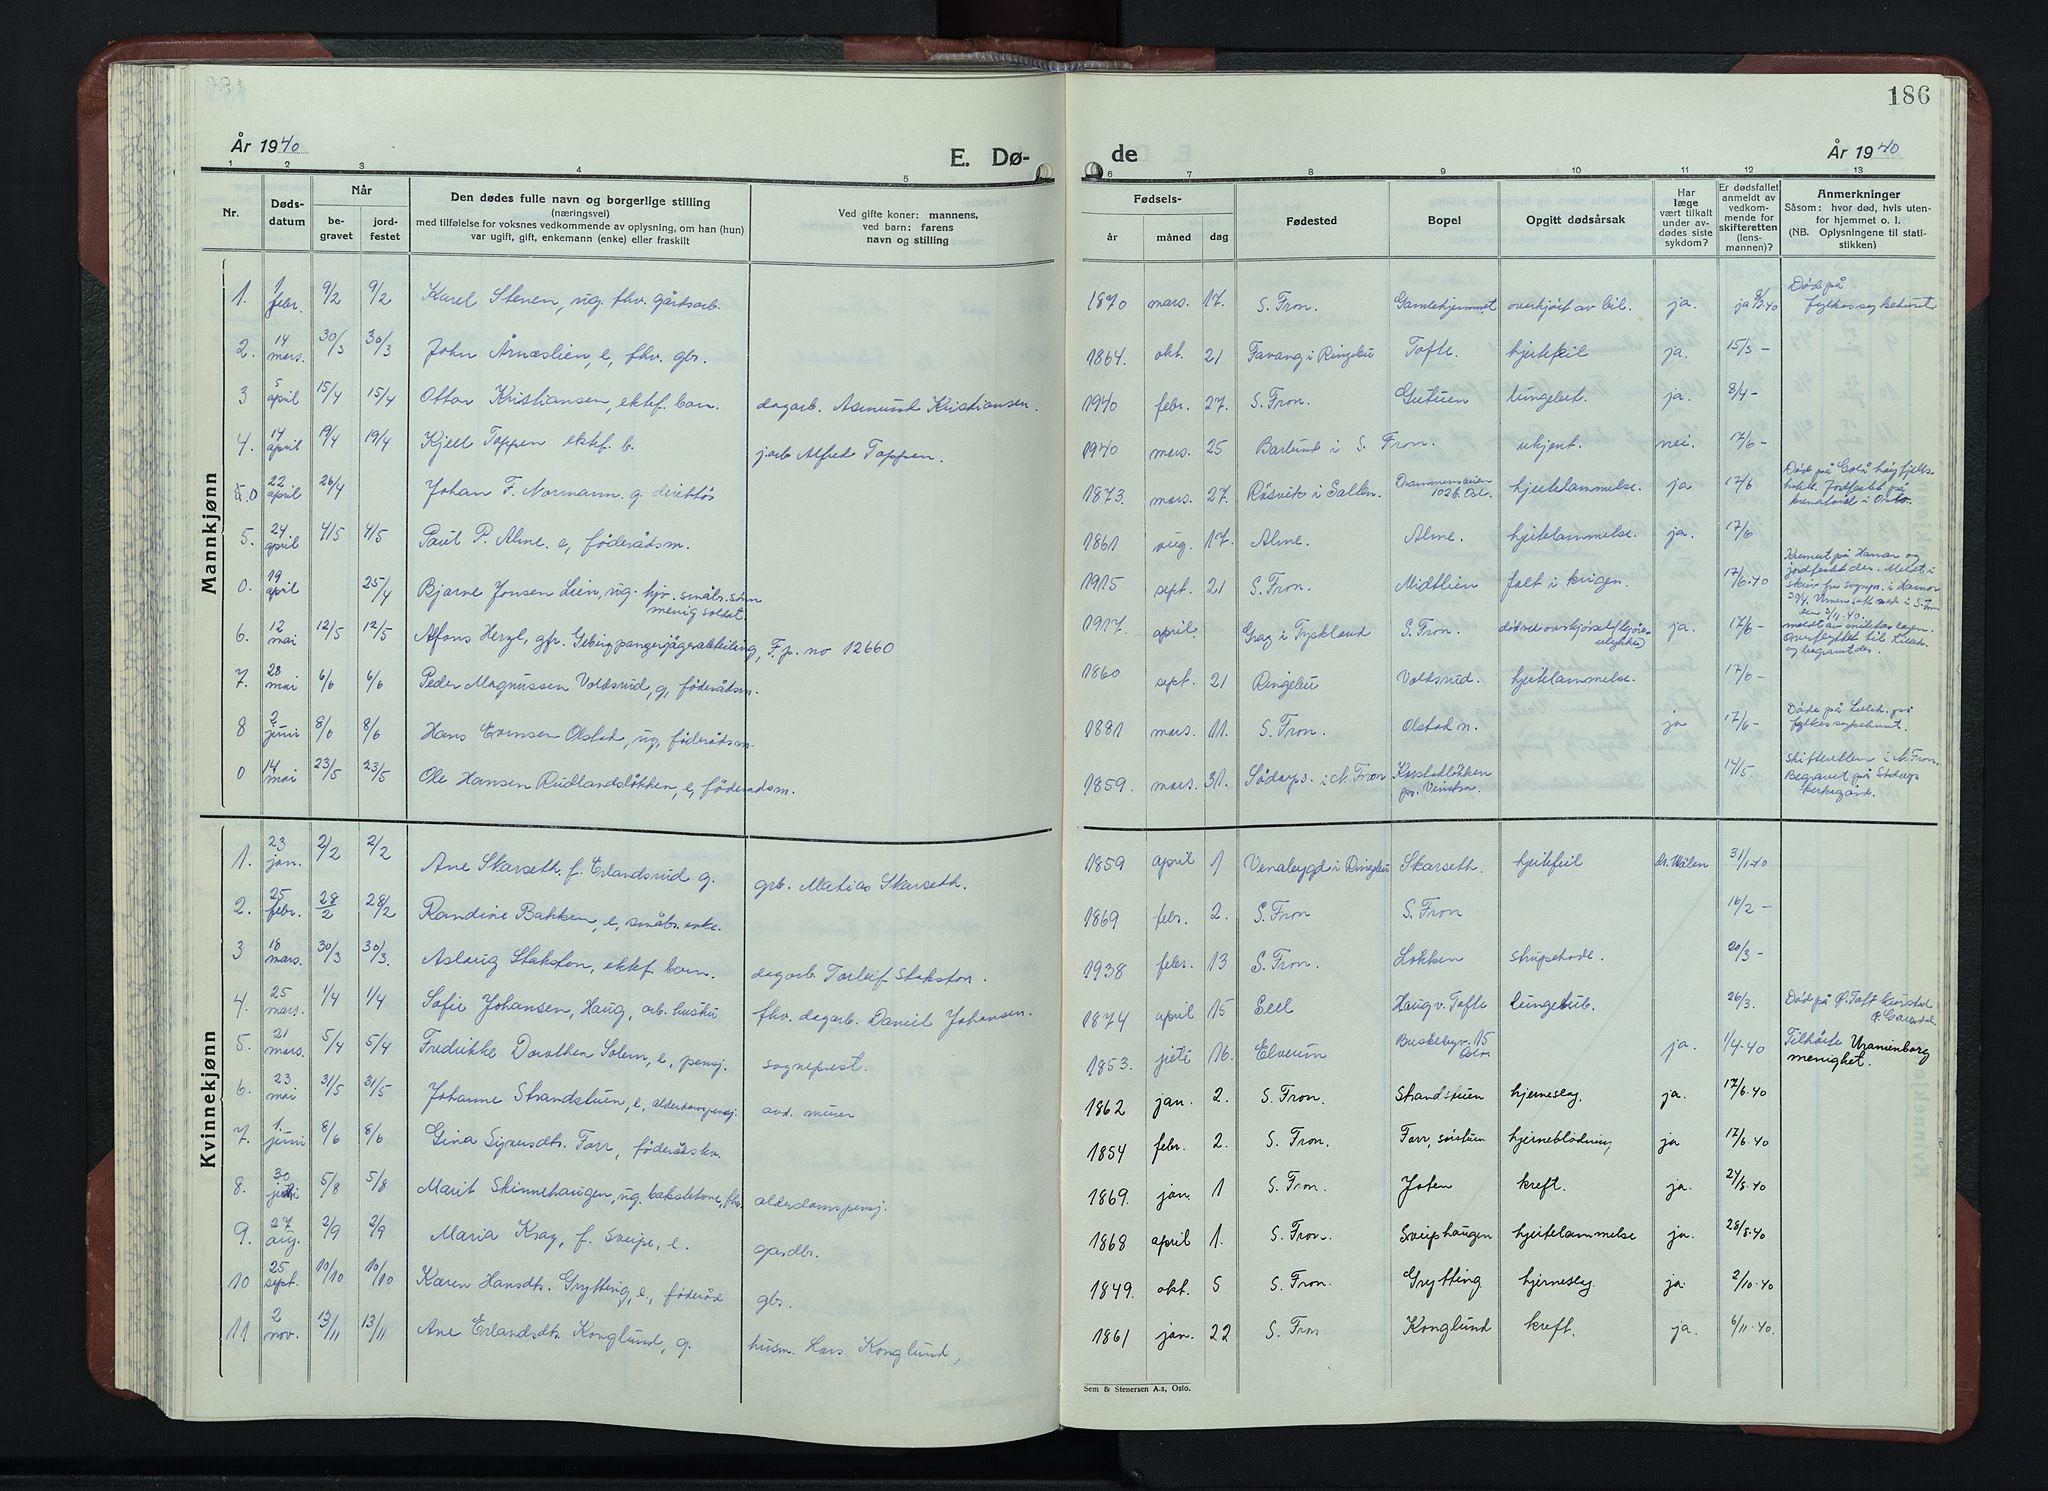 SAH, Sør-Fron prestekontor, H/Ha/Hab/L0006: Klokkerbok nr. 6, 1933-1948, s. 186